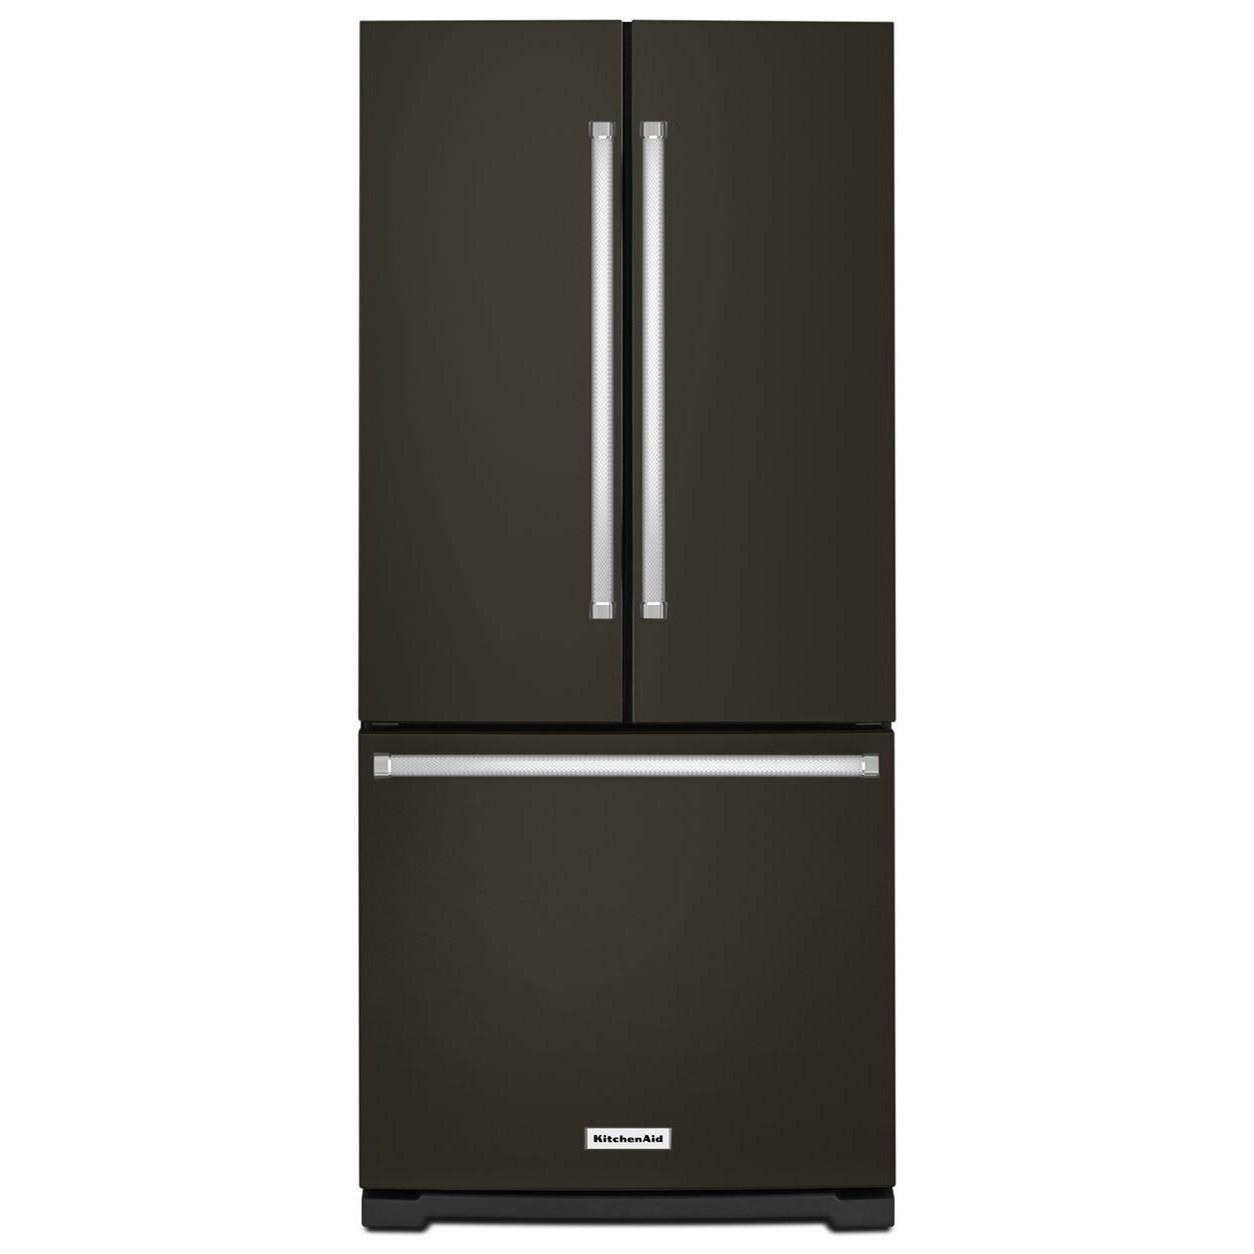 Krfc300ebs Kitchenaid 20 Cu Ft 36 Width Counter Depth: KitchenAid 20 Cu. Ft. 30-Inch Width Standard Depth French Door Refrigerator With Interior